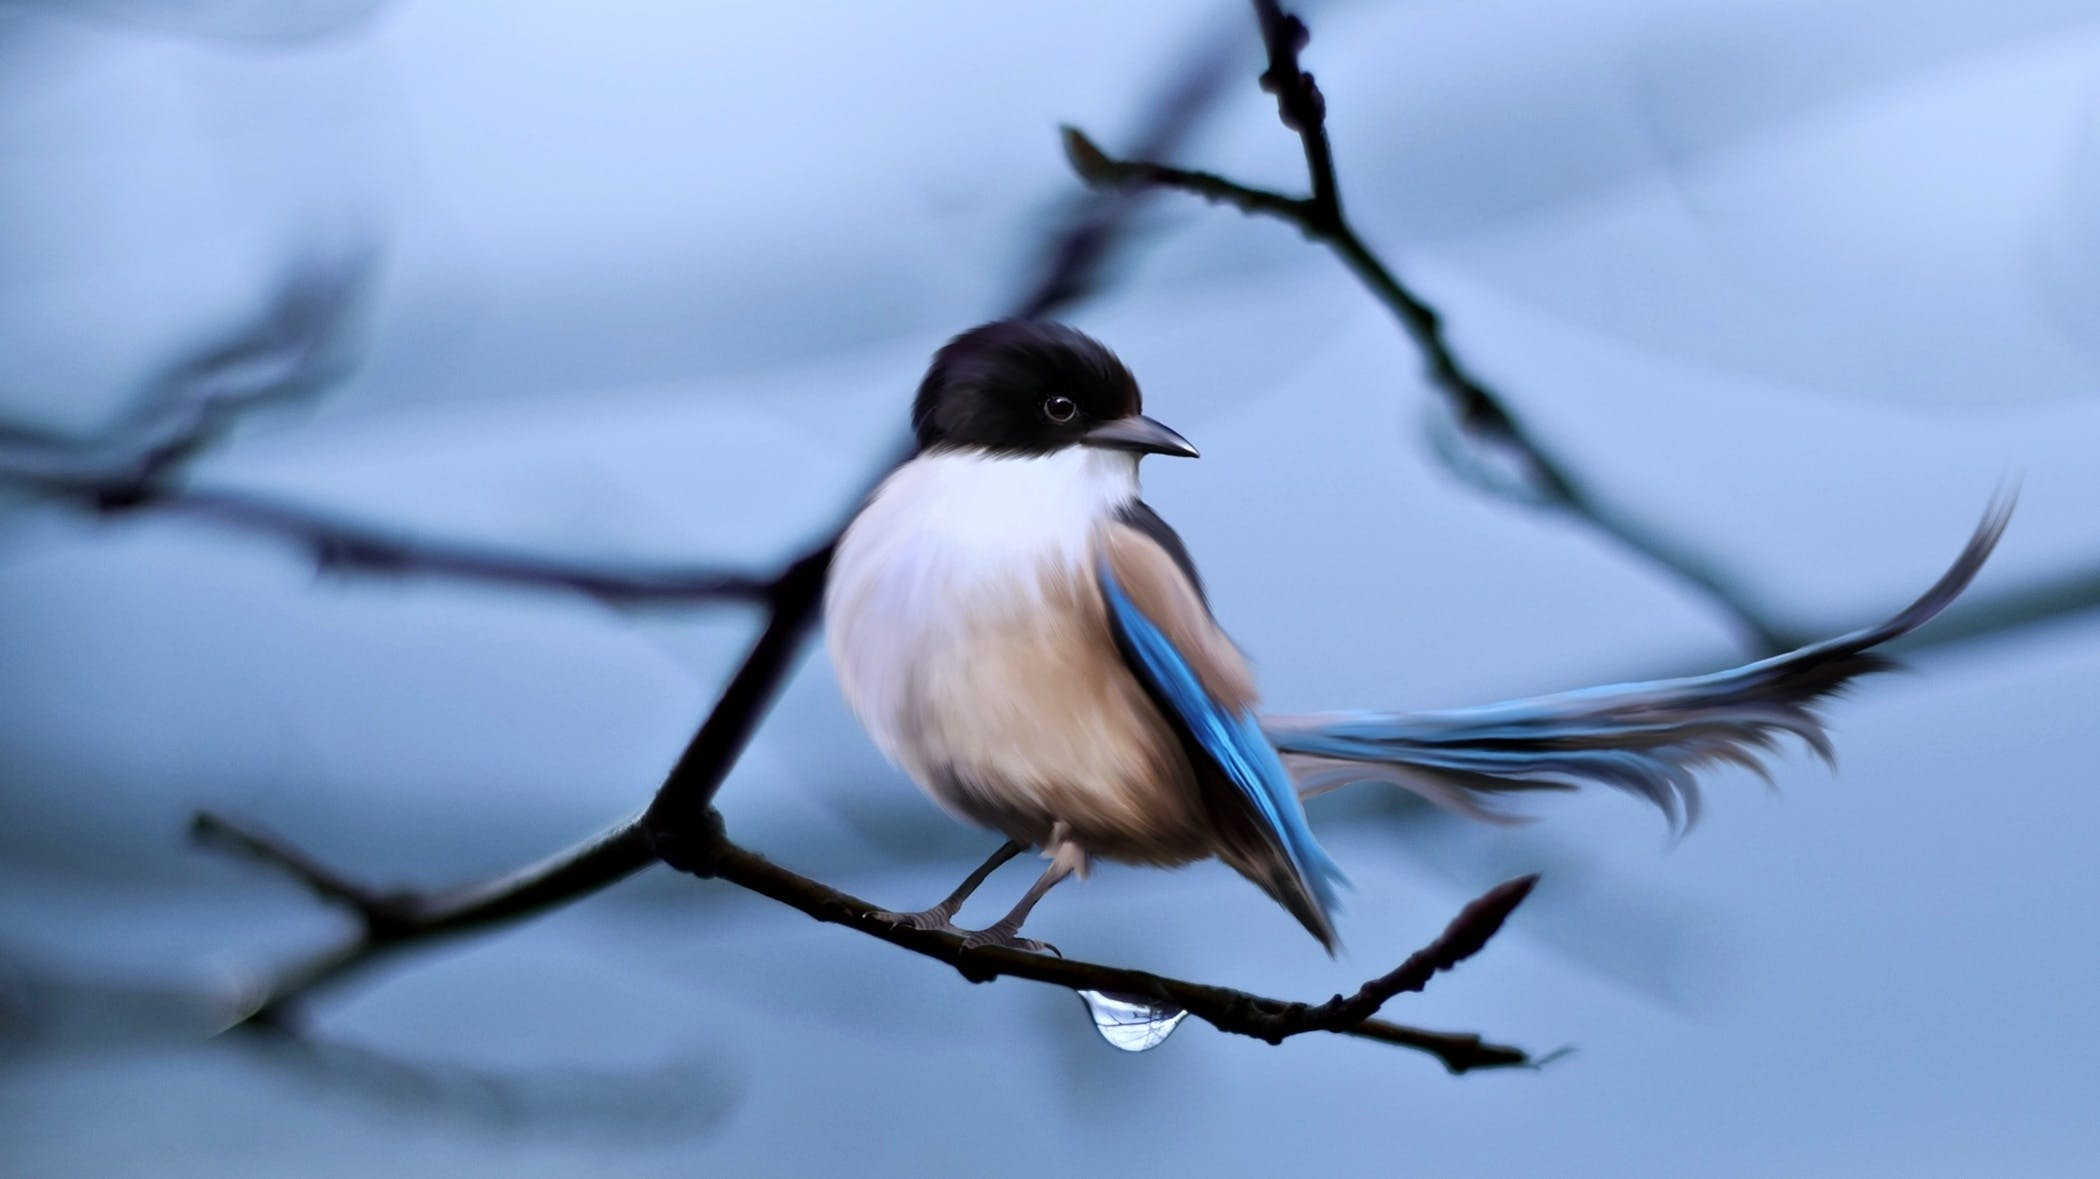 animal, bird, branches